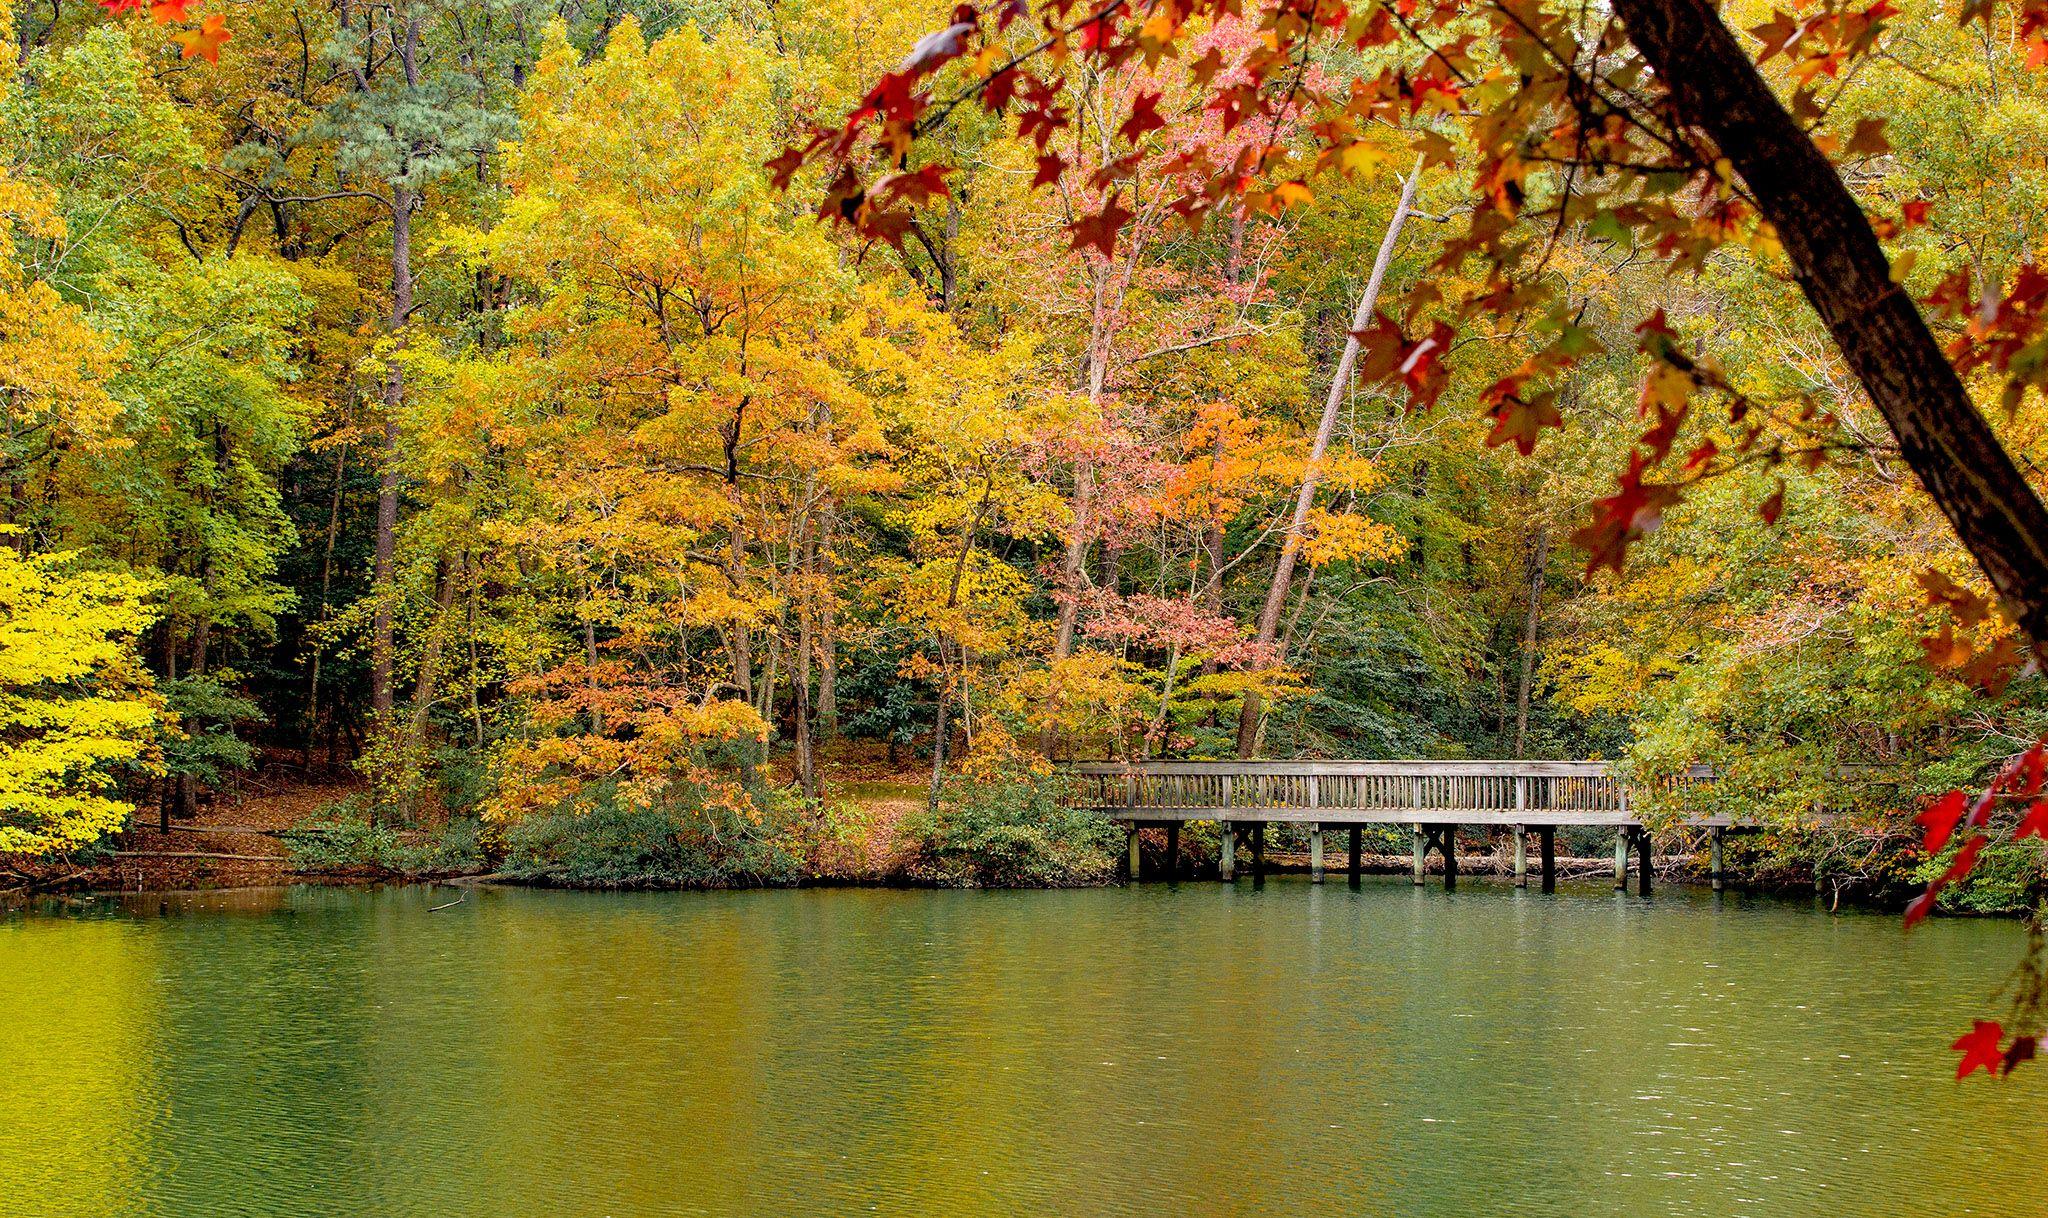 Peak leaf color in the Park